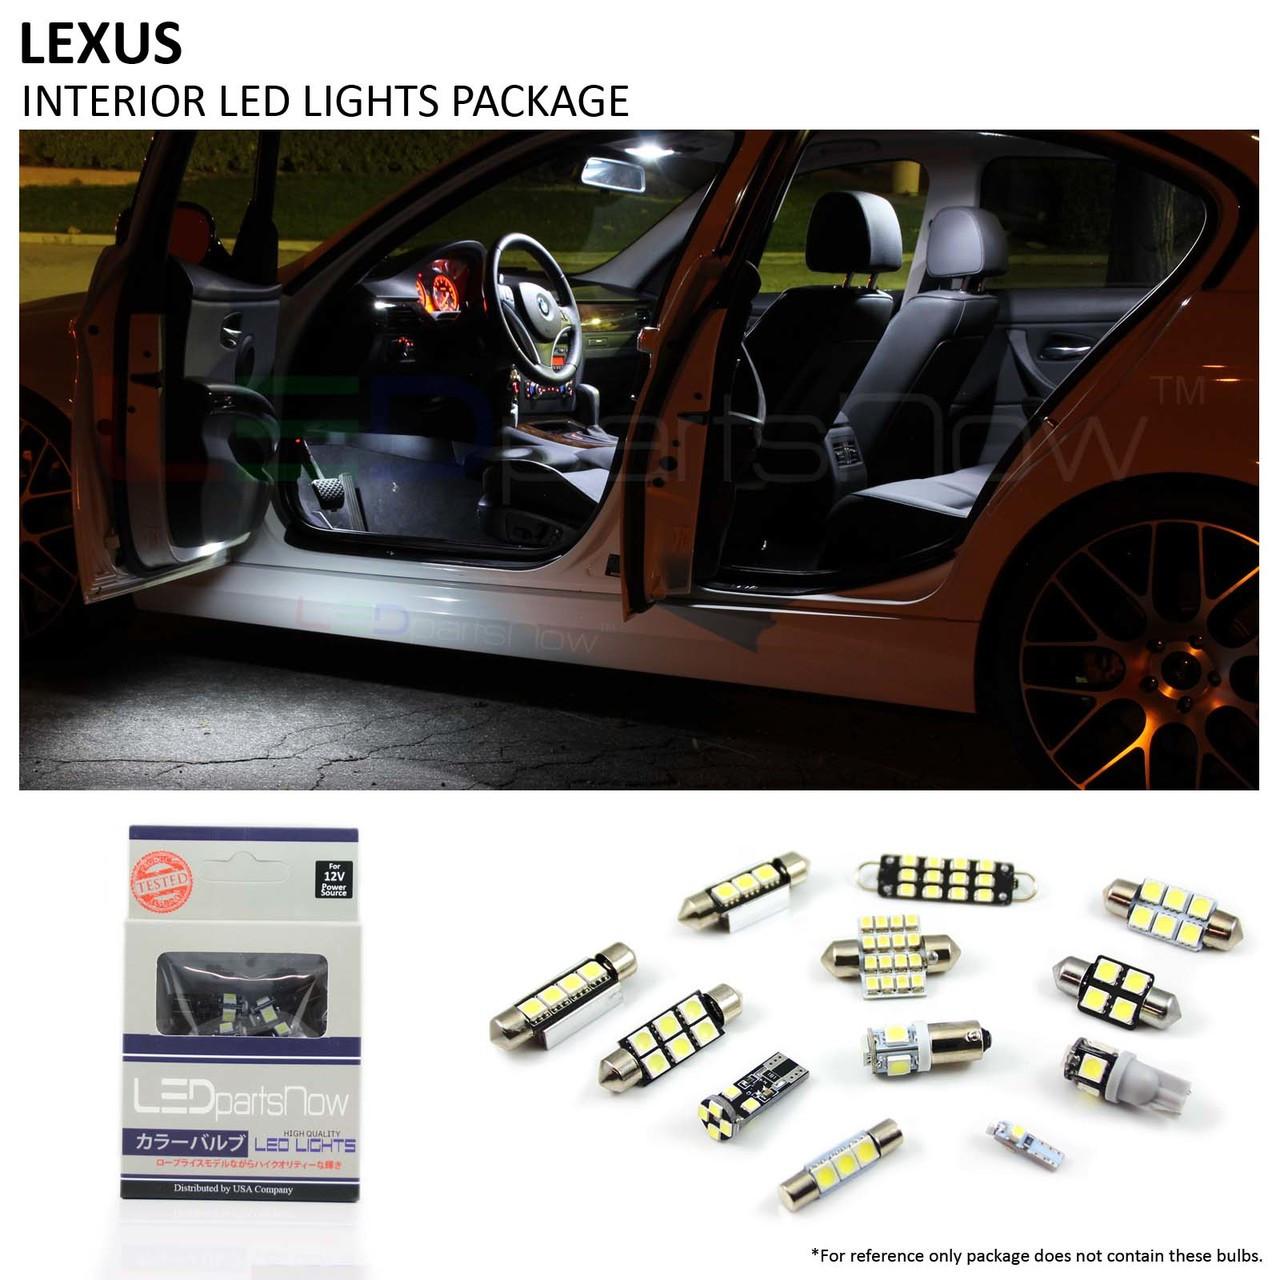 2010 2015 lexus rx interior led lights package image 1 lexus rx 450h wiring diagram  [ 1280 x 1280 Pixel ]